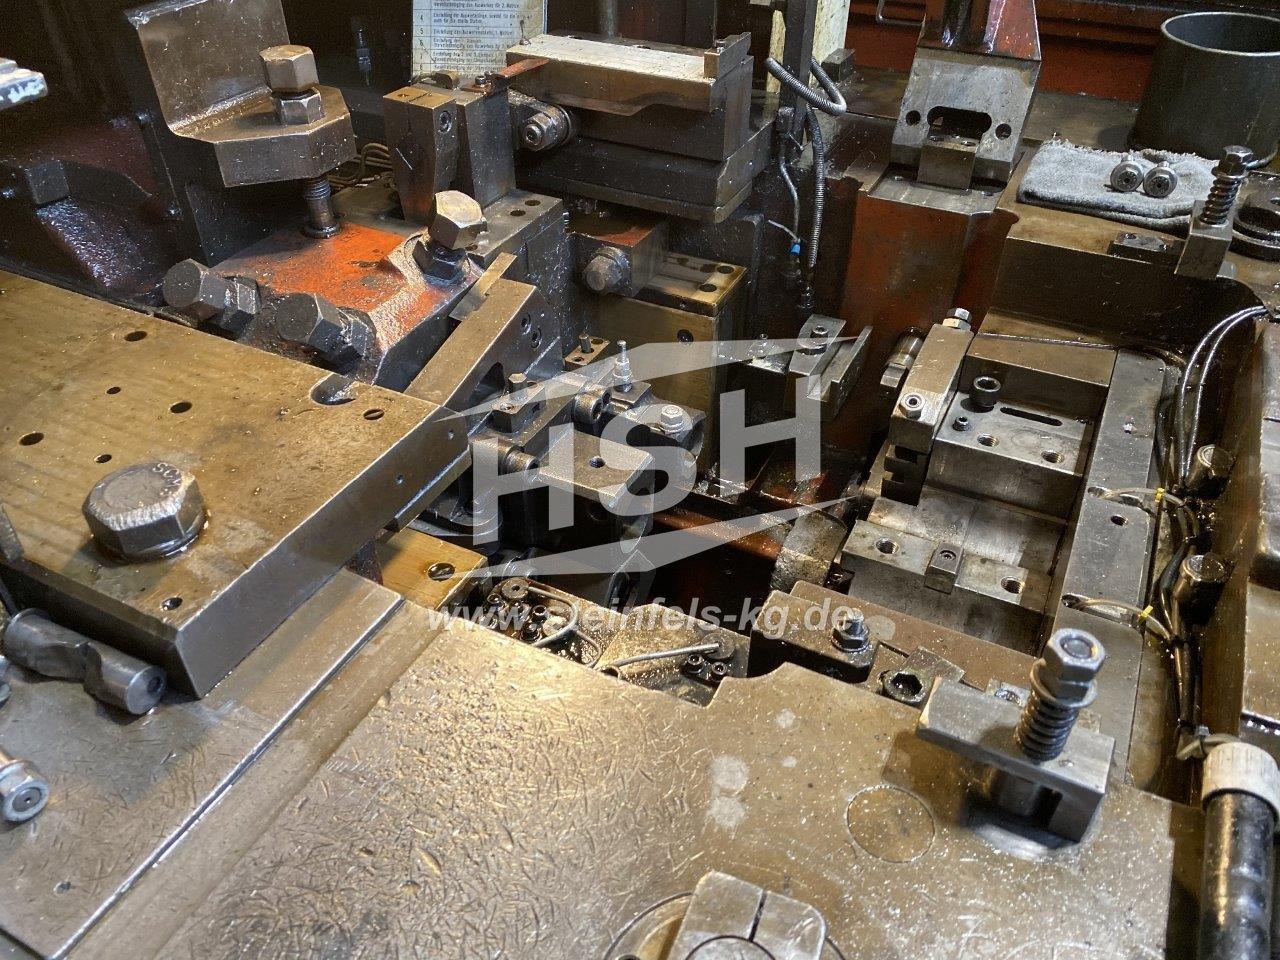 M08I/8313 – ASAHI – ORH120 – 1988 – 6-14 mm